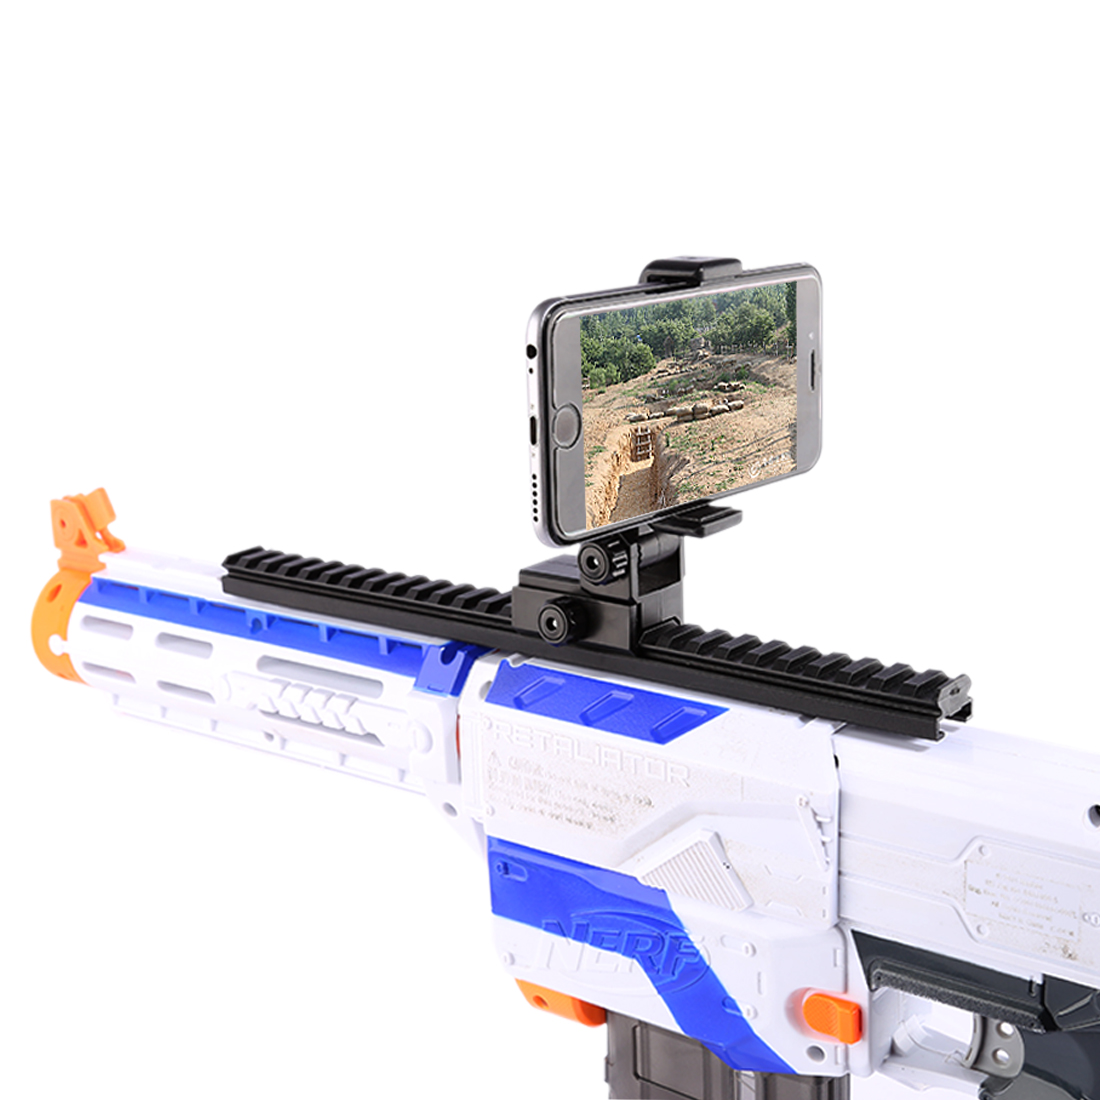 Jinming Tactical Adjustable Video Live Broadcast Phone Holder Cellphone Support Mount for Nerf - Black стоимость